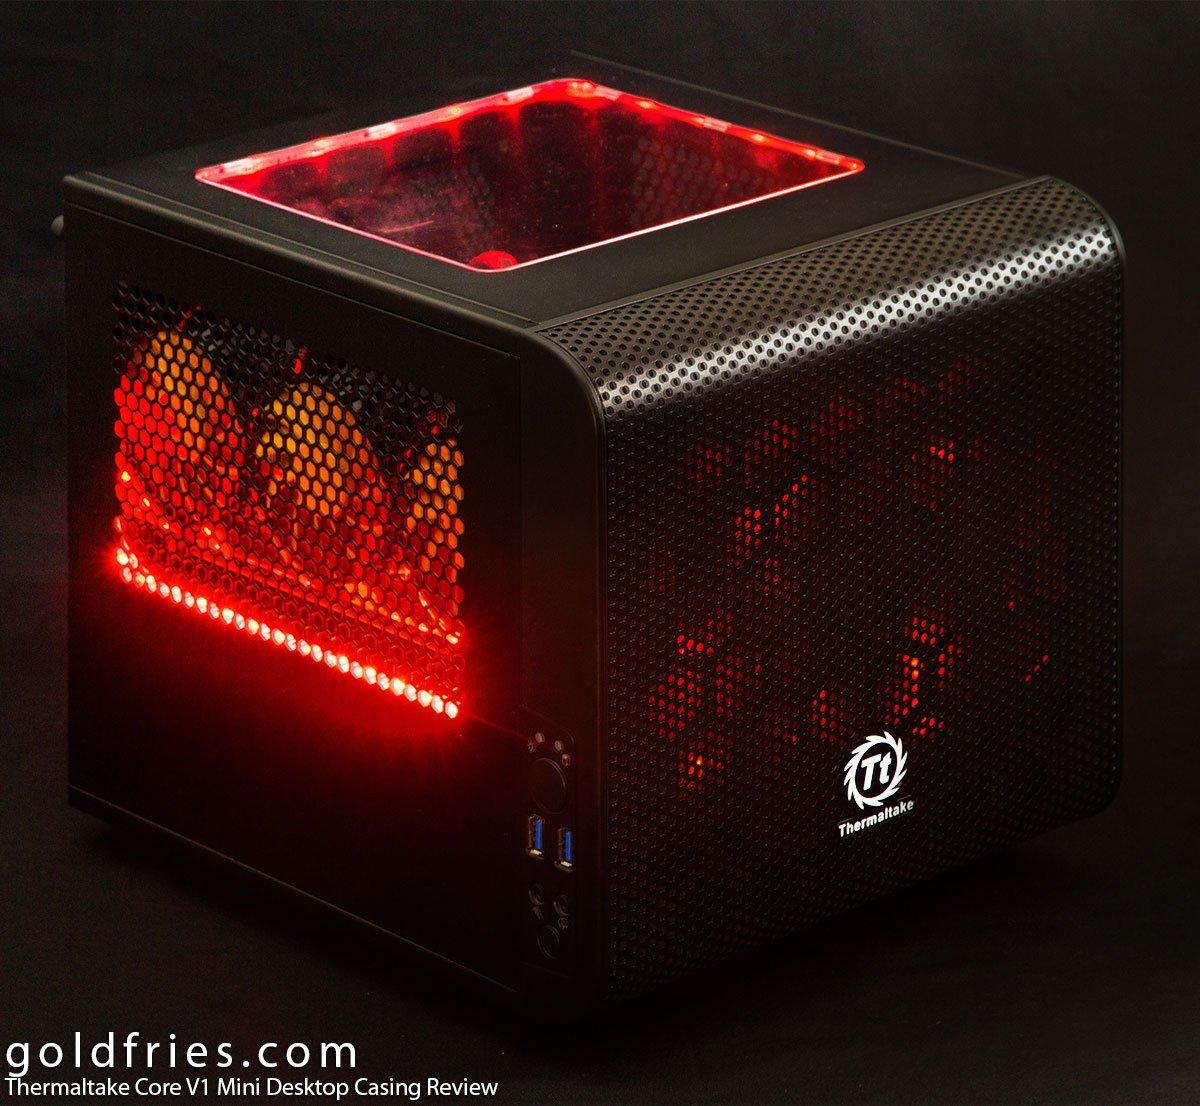 ThermalTake Core V1 Mini Desktop Casing Review 3